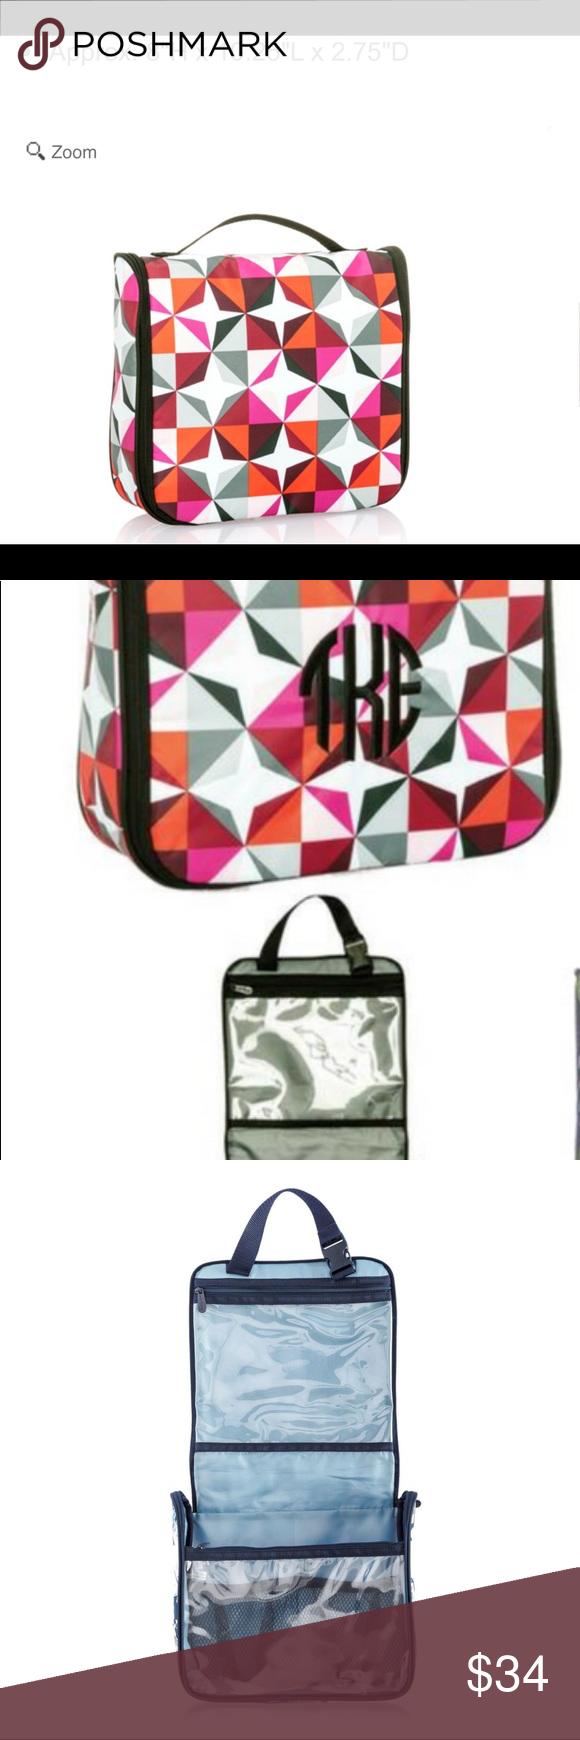 NEW-Thirty-One Hanging Traveler Case-Origami Pop NEW in package- Hanging Travele...#caseorigami #hanging #newthirtyone #package #pop #travele #traveler